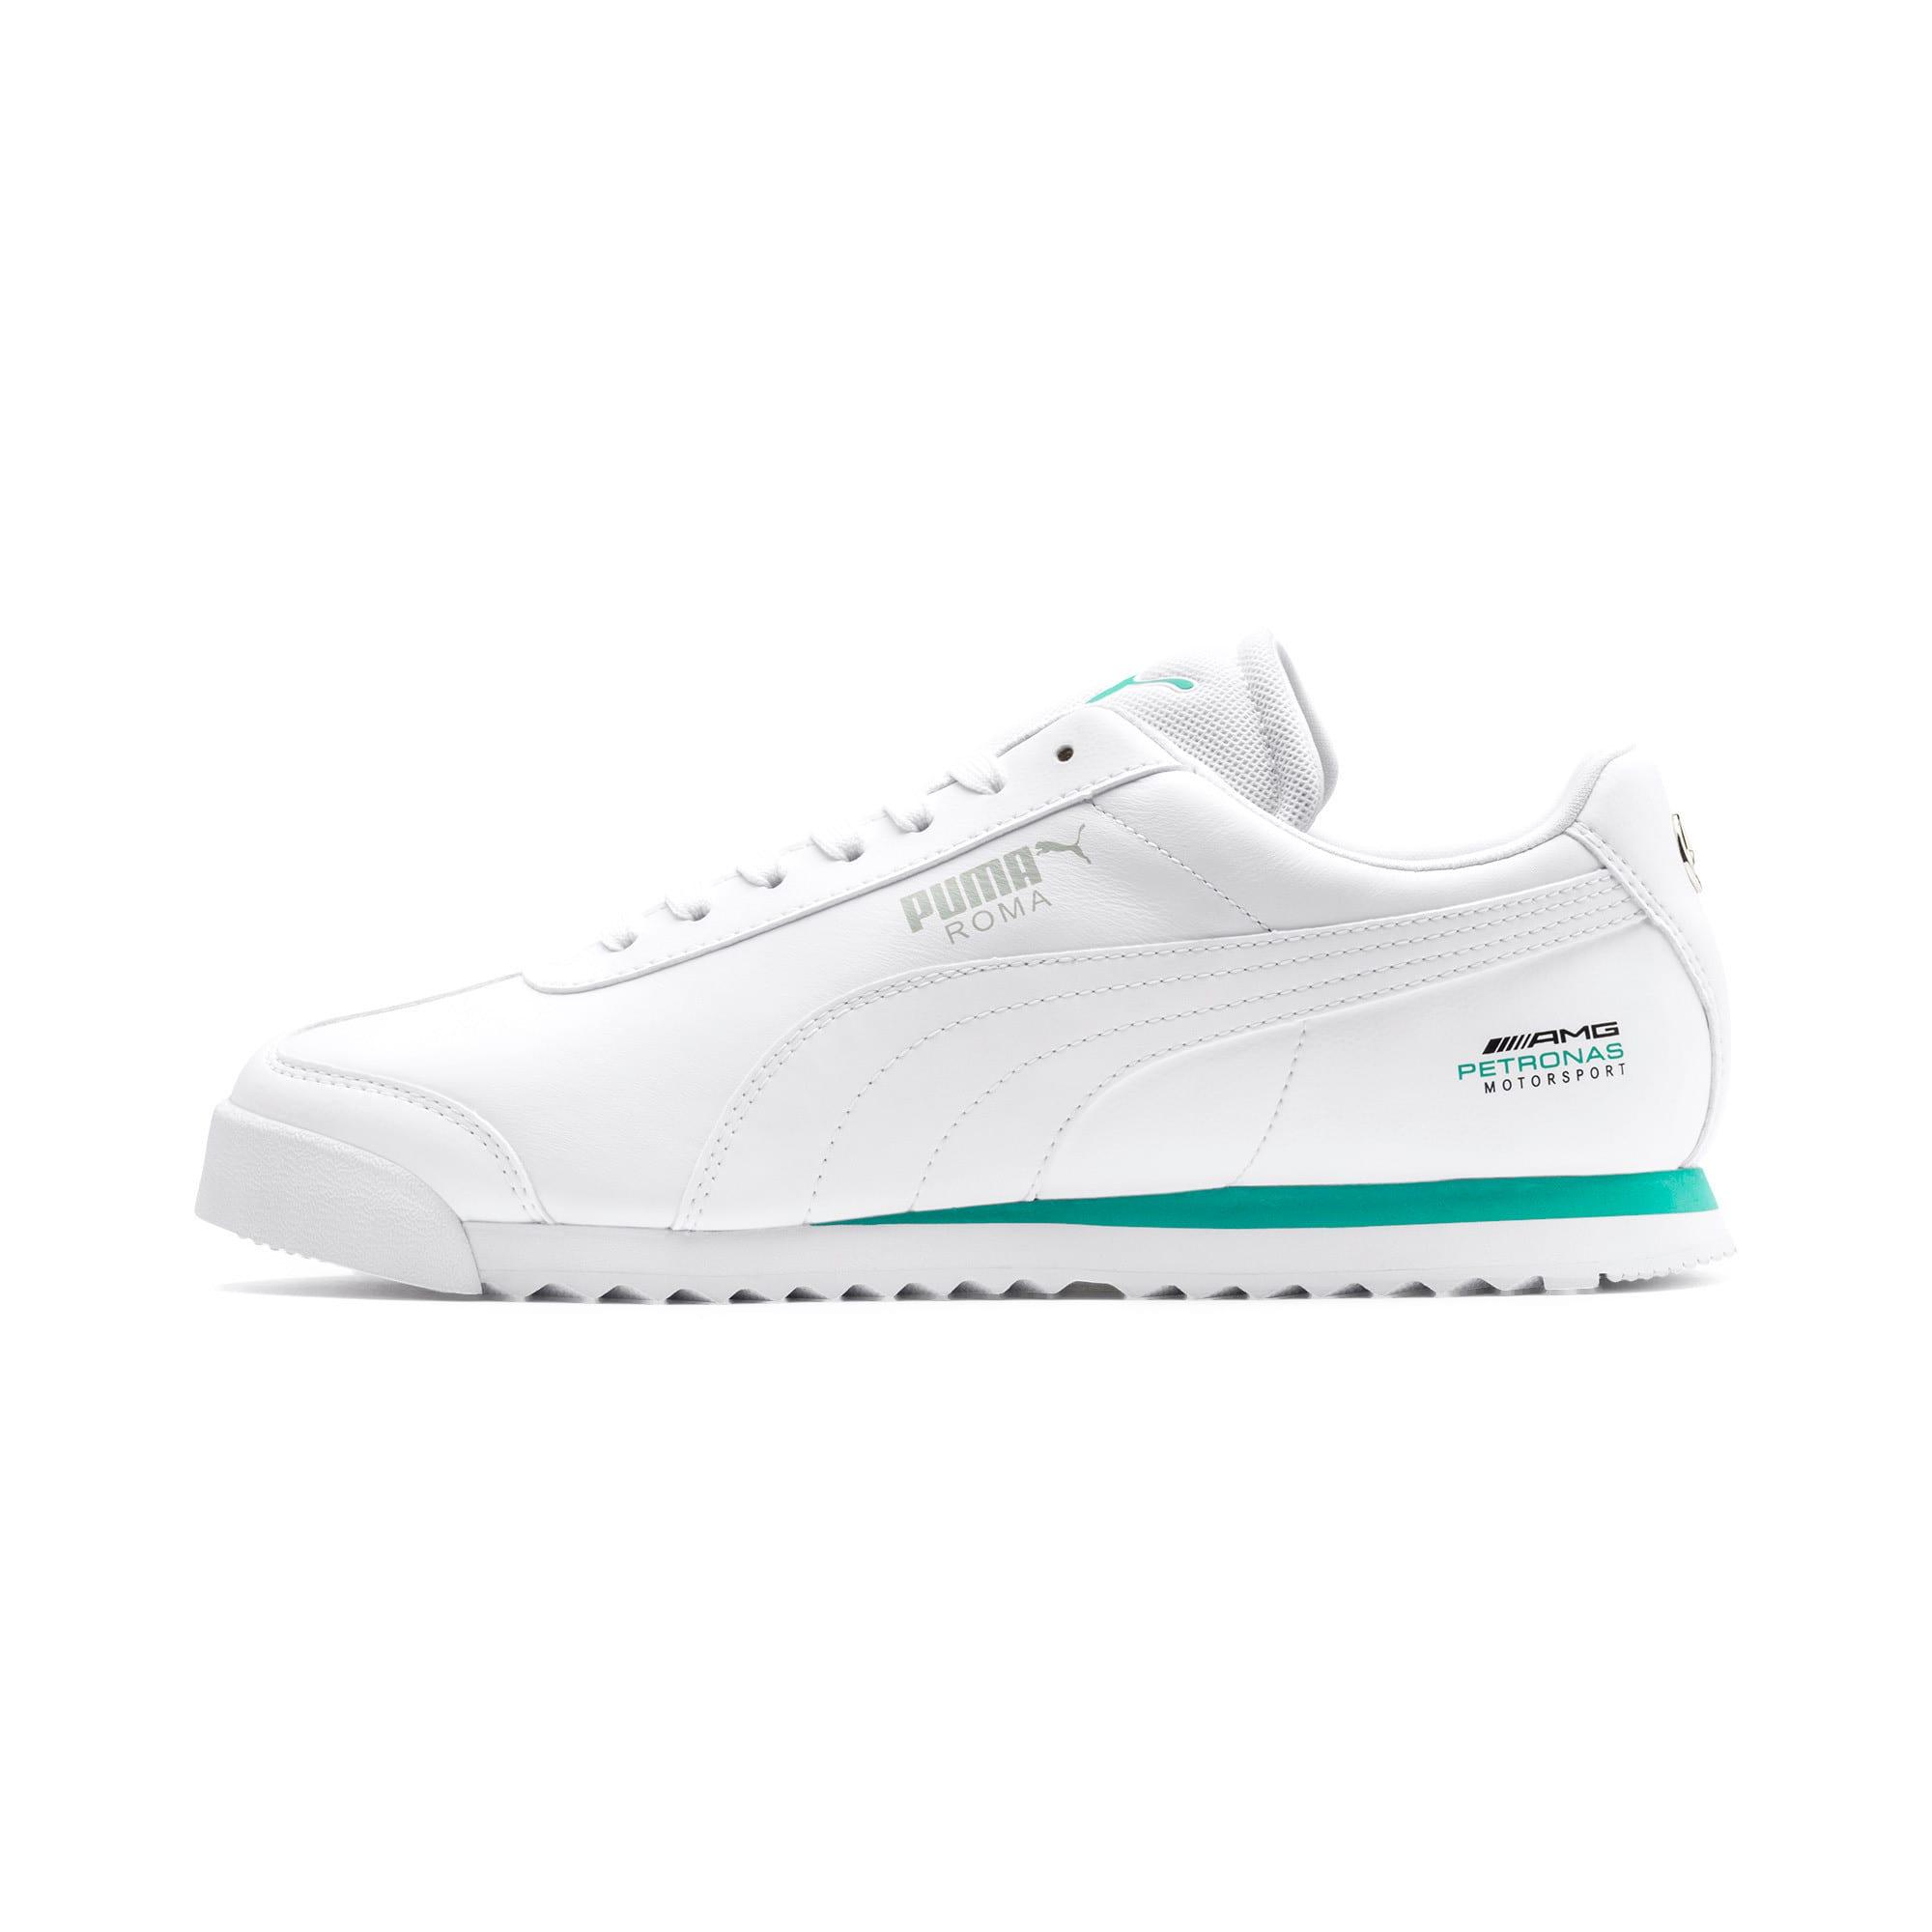 Thumbnail 1 of Mercedes AMG Petronas Roma Men's Sneakers, Puma White-Puma White, medium